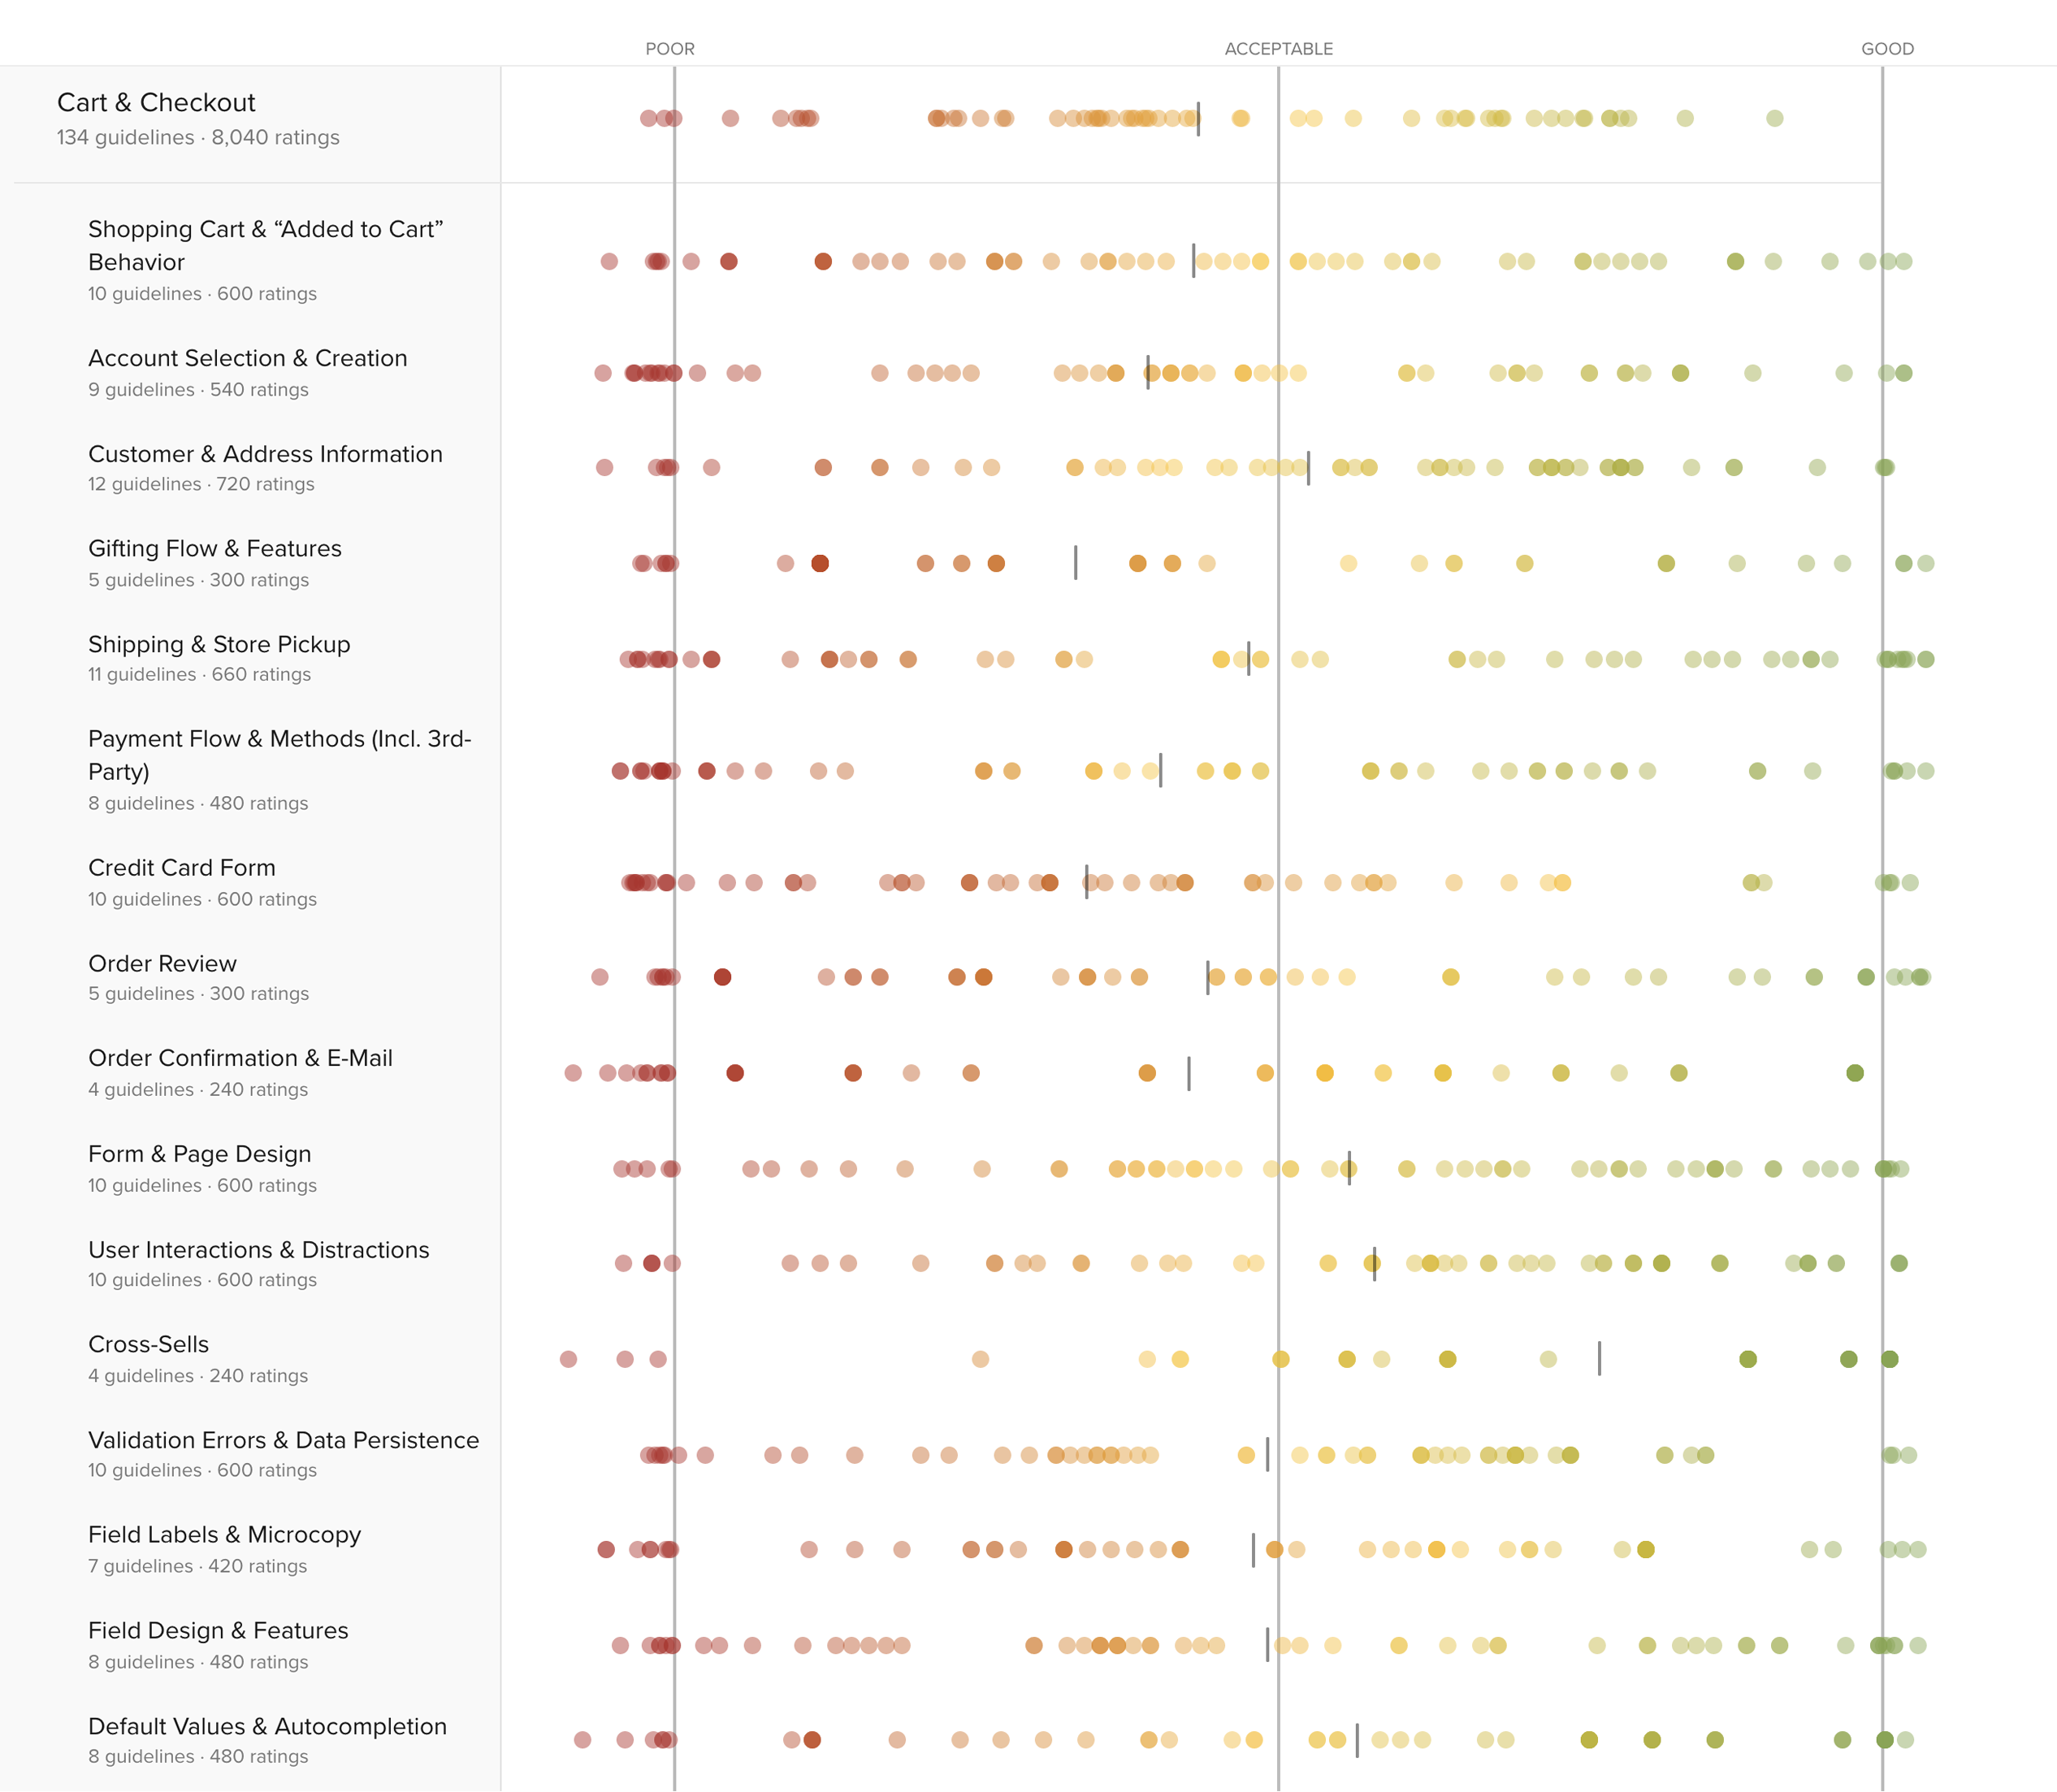 E-Commerce Checkout Usability: An Original Research Study - Cart